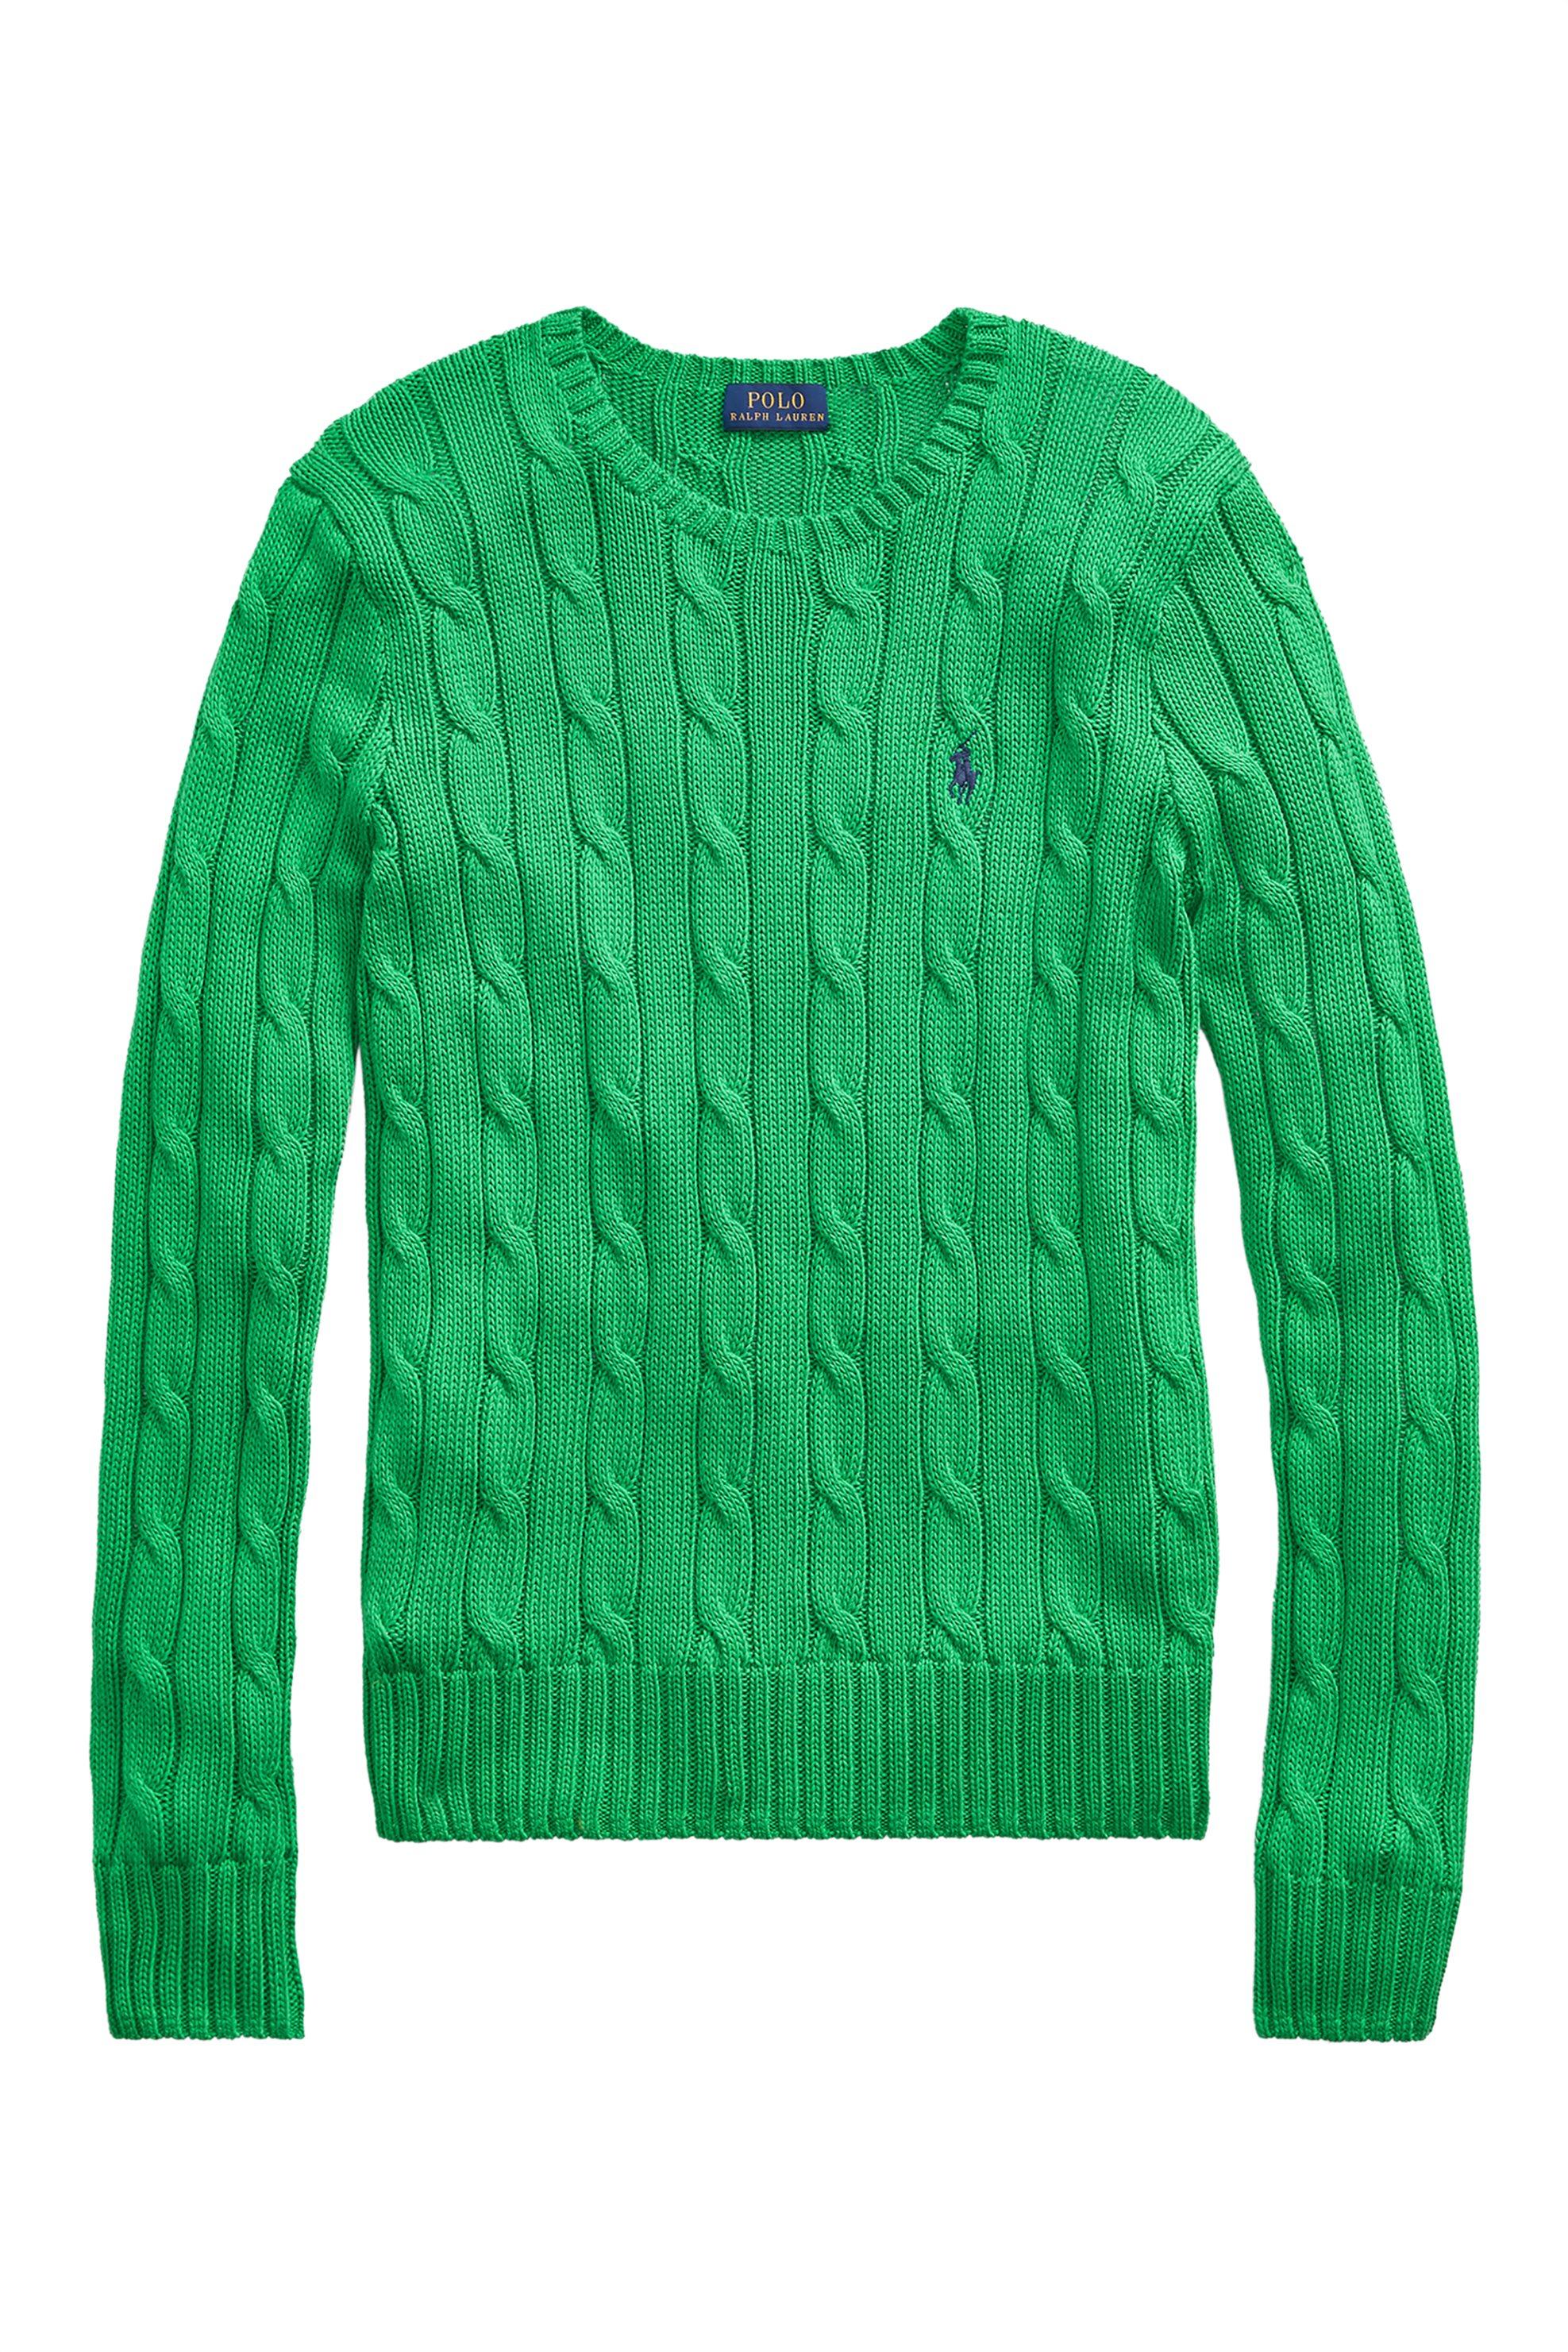 2523ea827910 Polo Ralph Lauren γυναικεία πλεκτή μπλούζα με σχέδιο πλεξούδες Cable-Knit -  2115